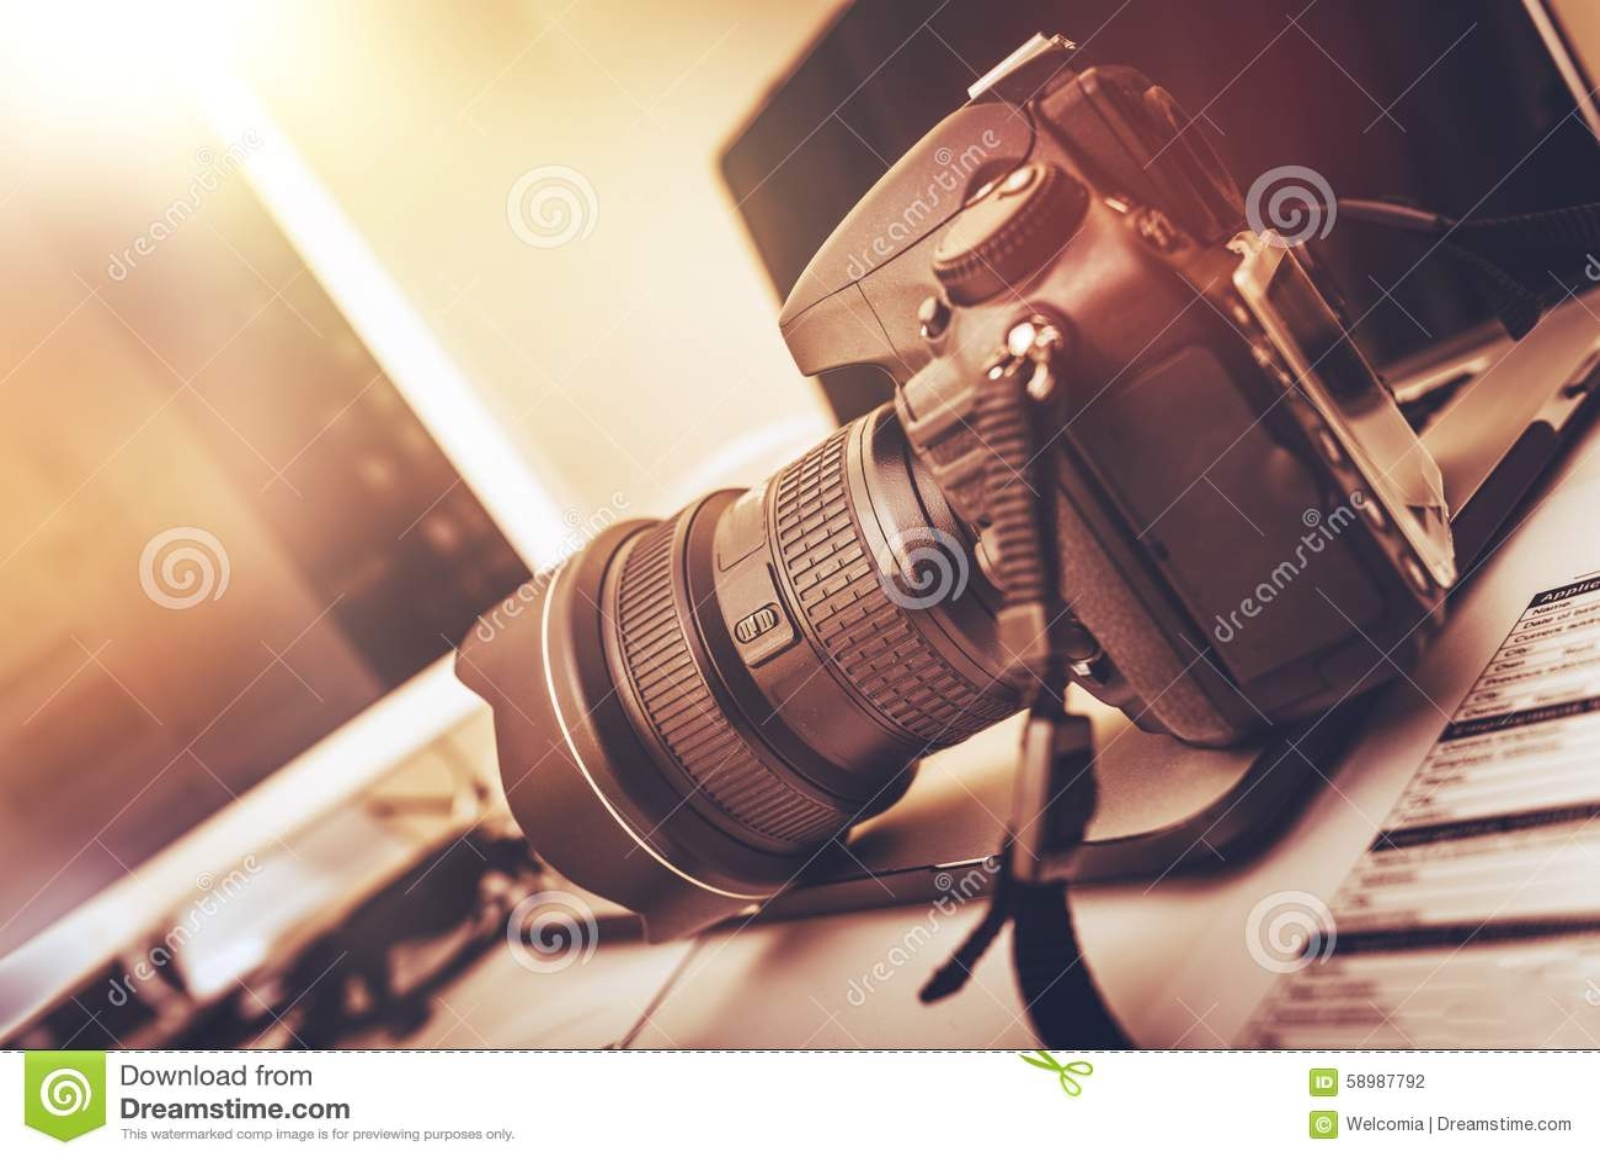 Fotografiewerkstation